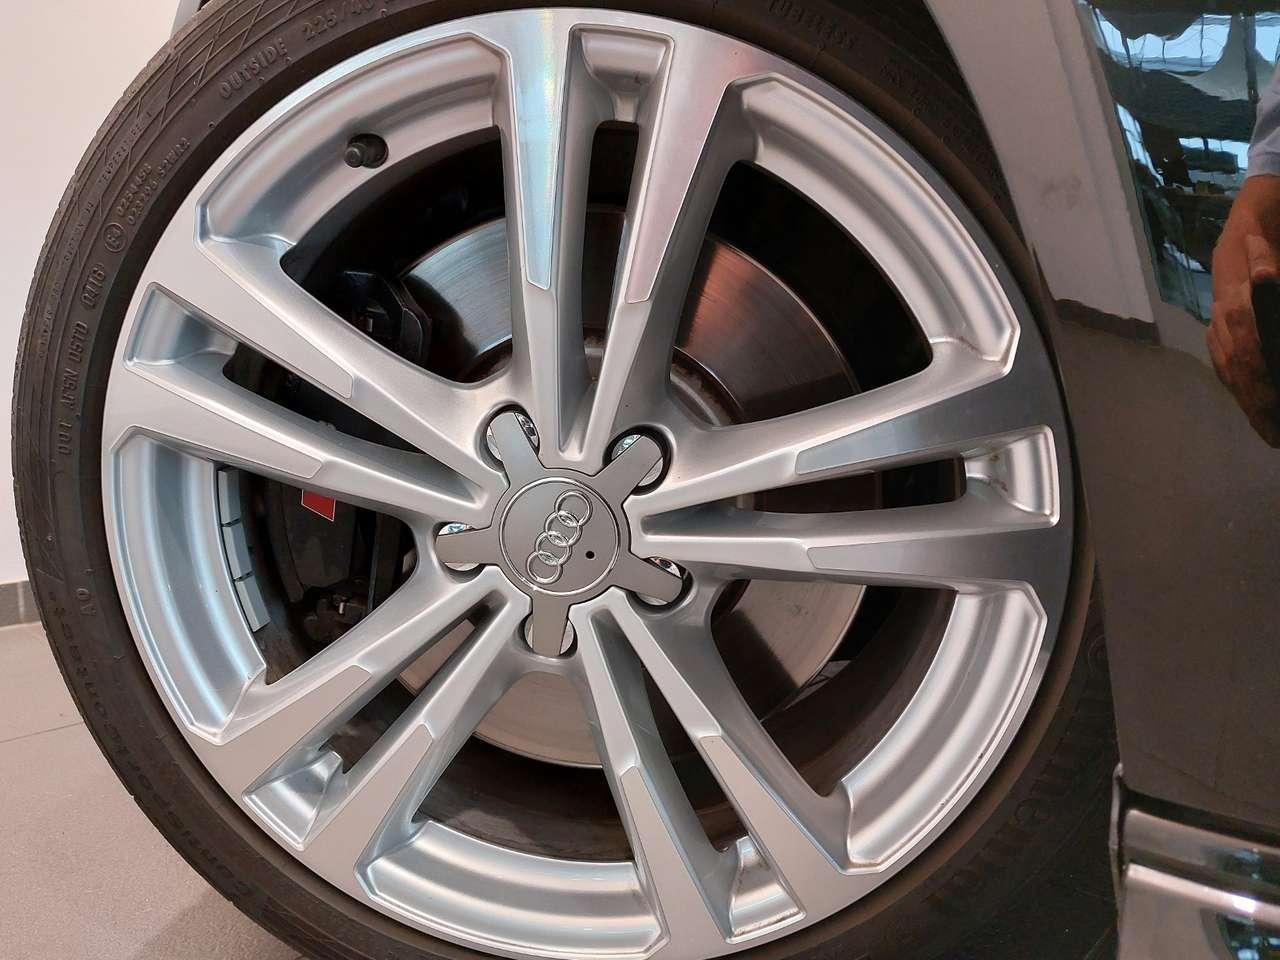 Audi S3 Sportback III 2 0 TFSI 300ch quattro